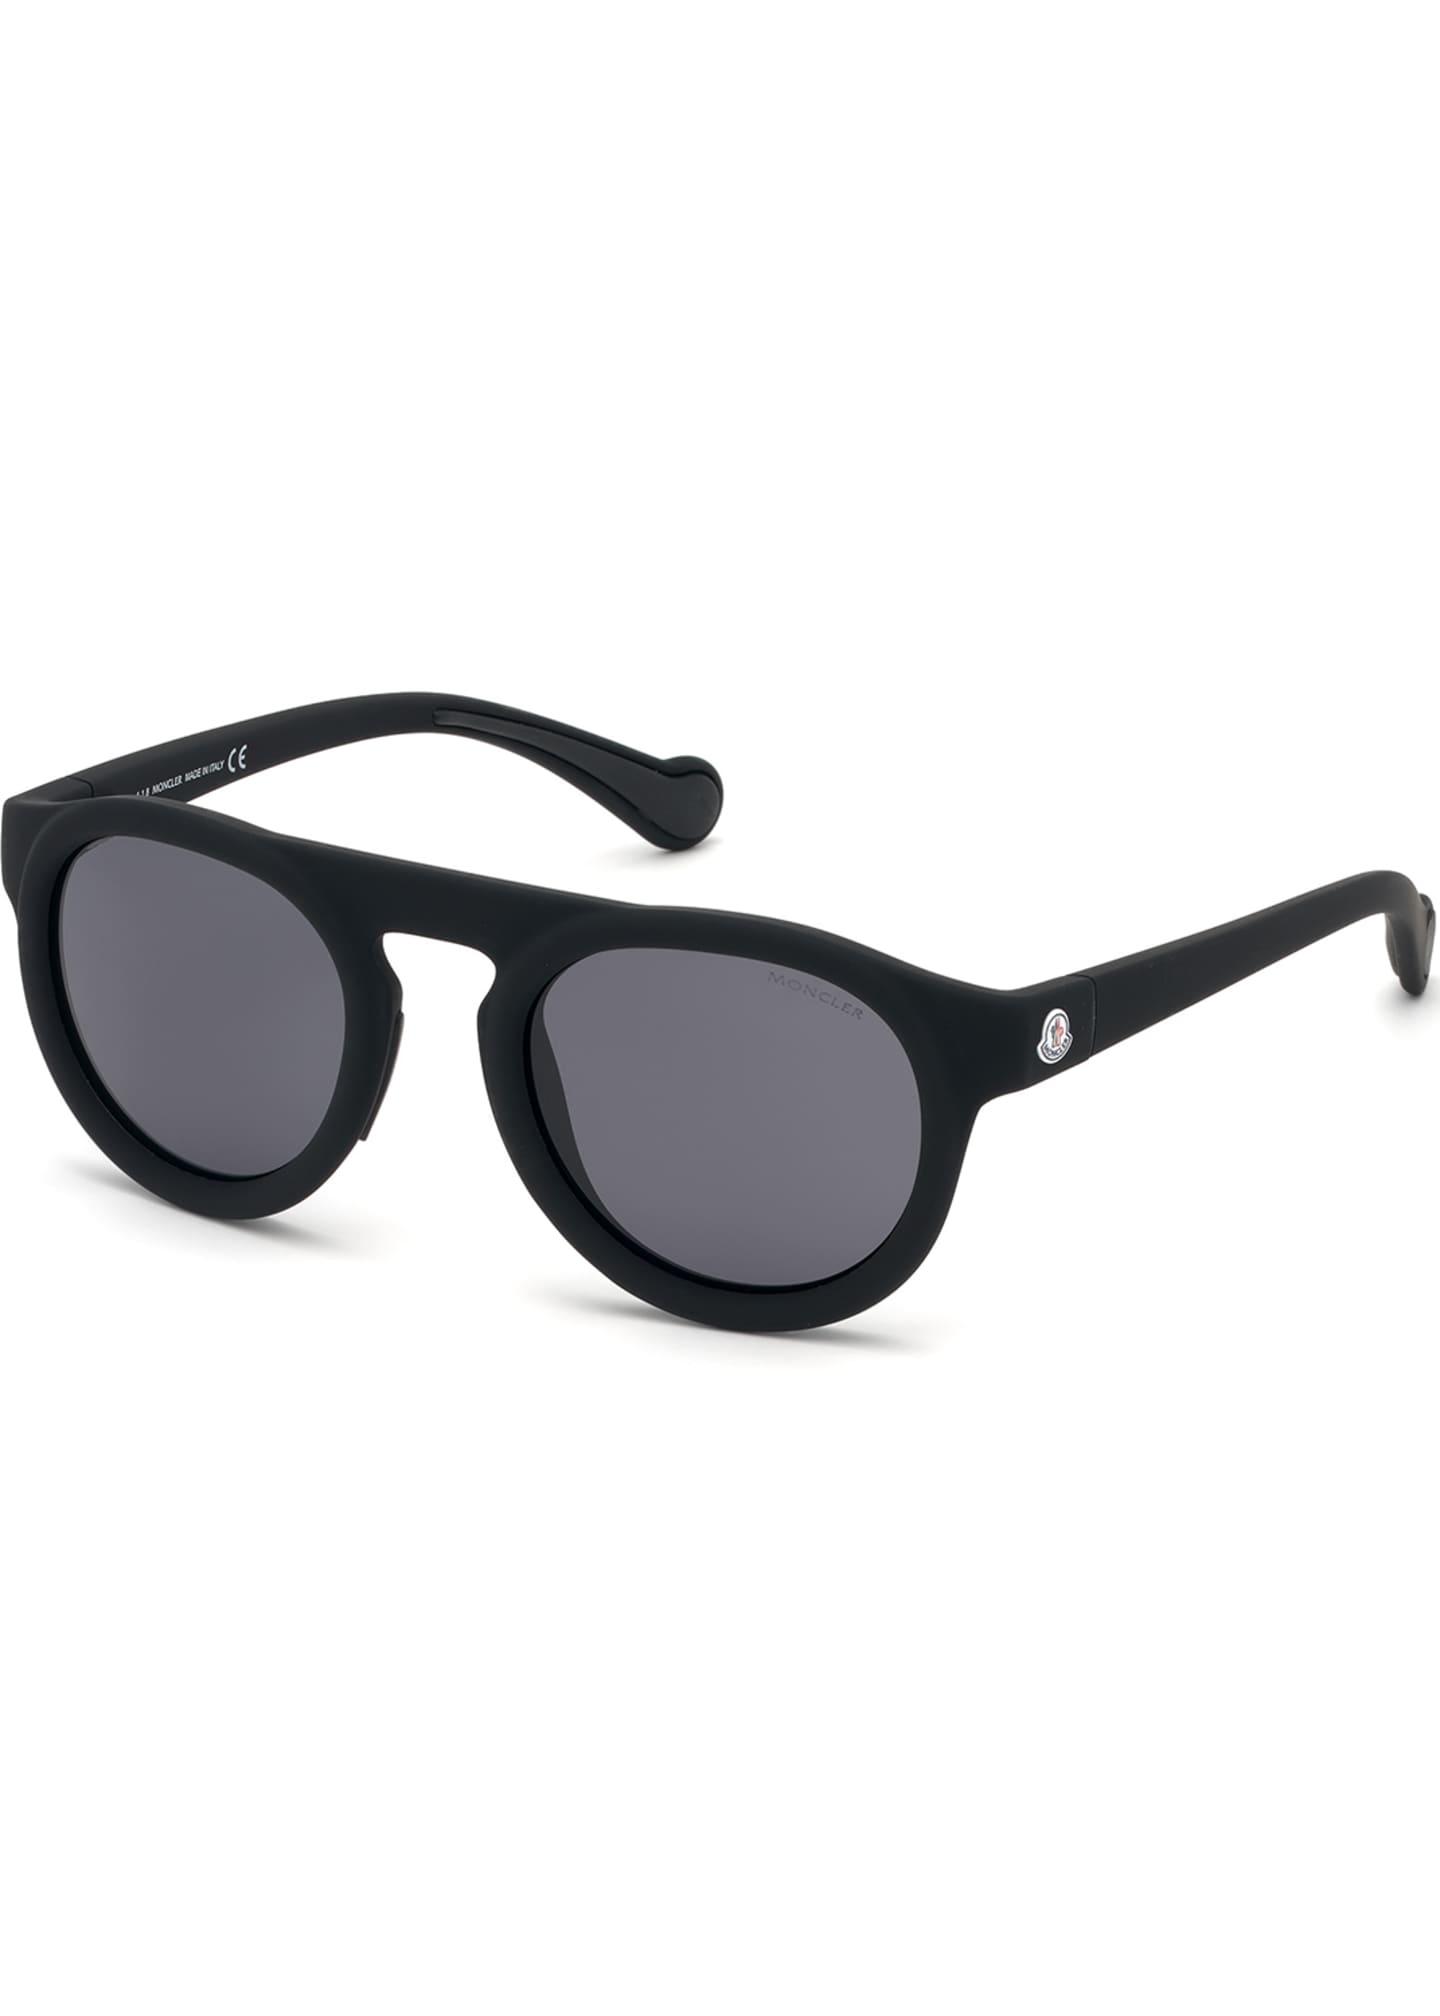 Moncler Men's Polarized Rectangle Sunglasses